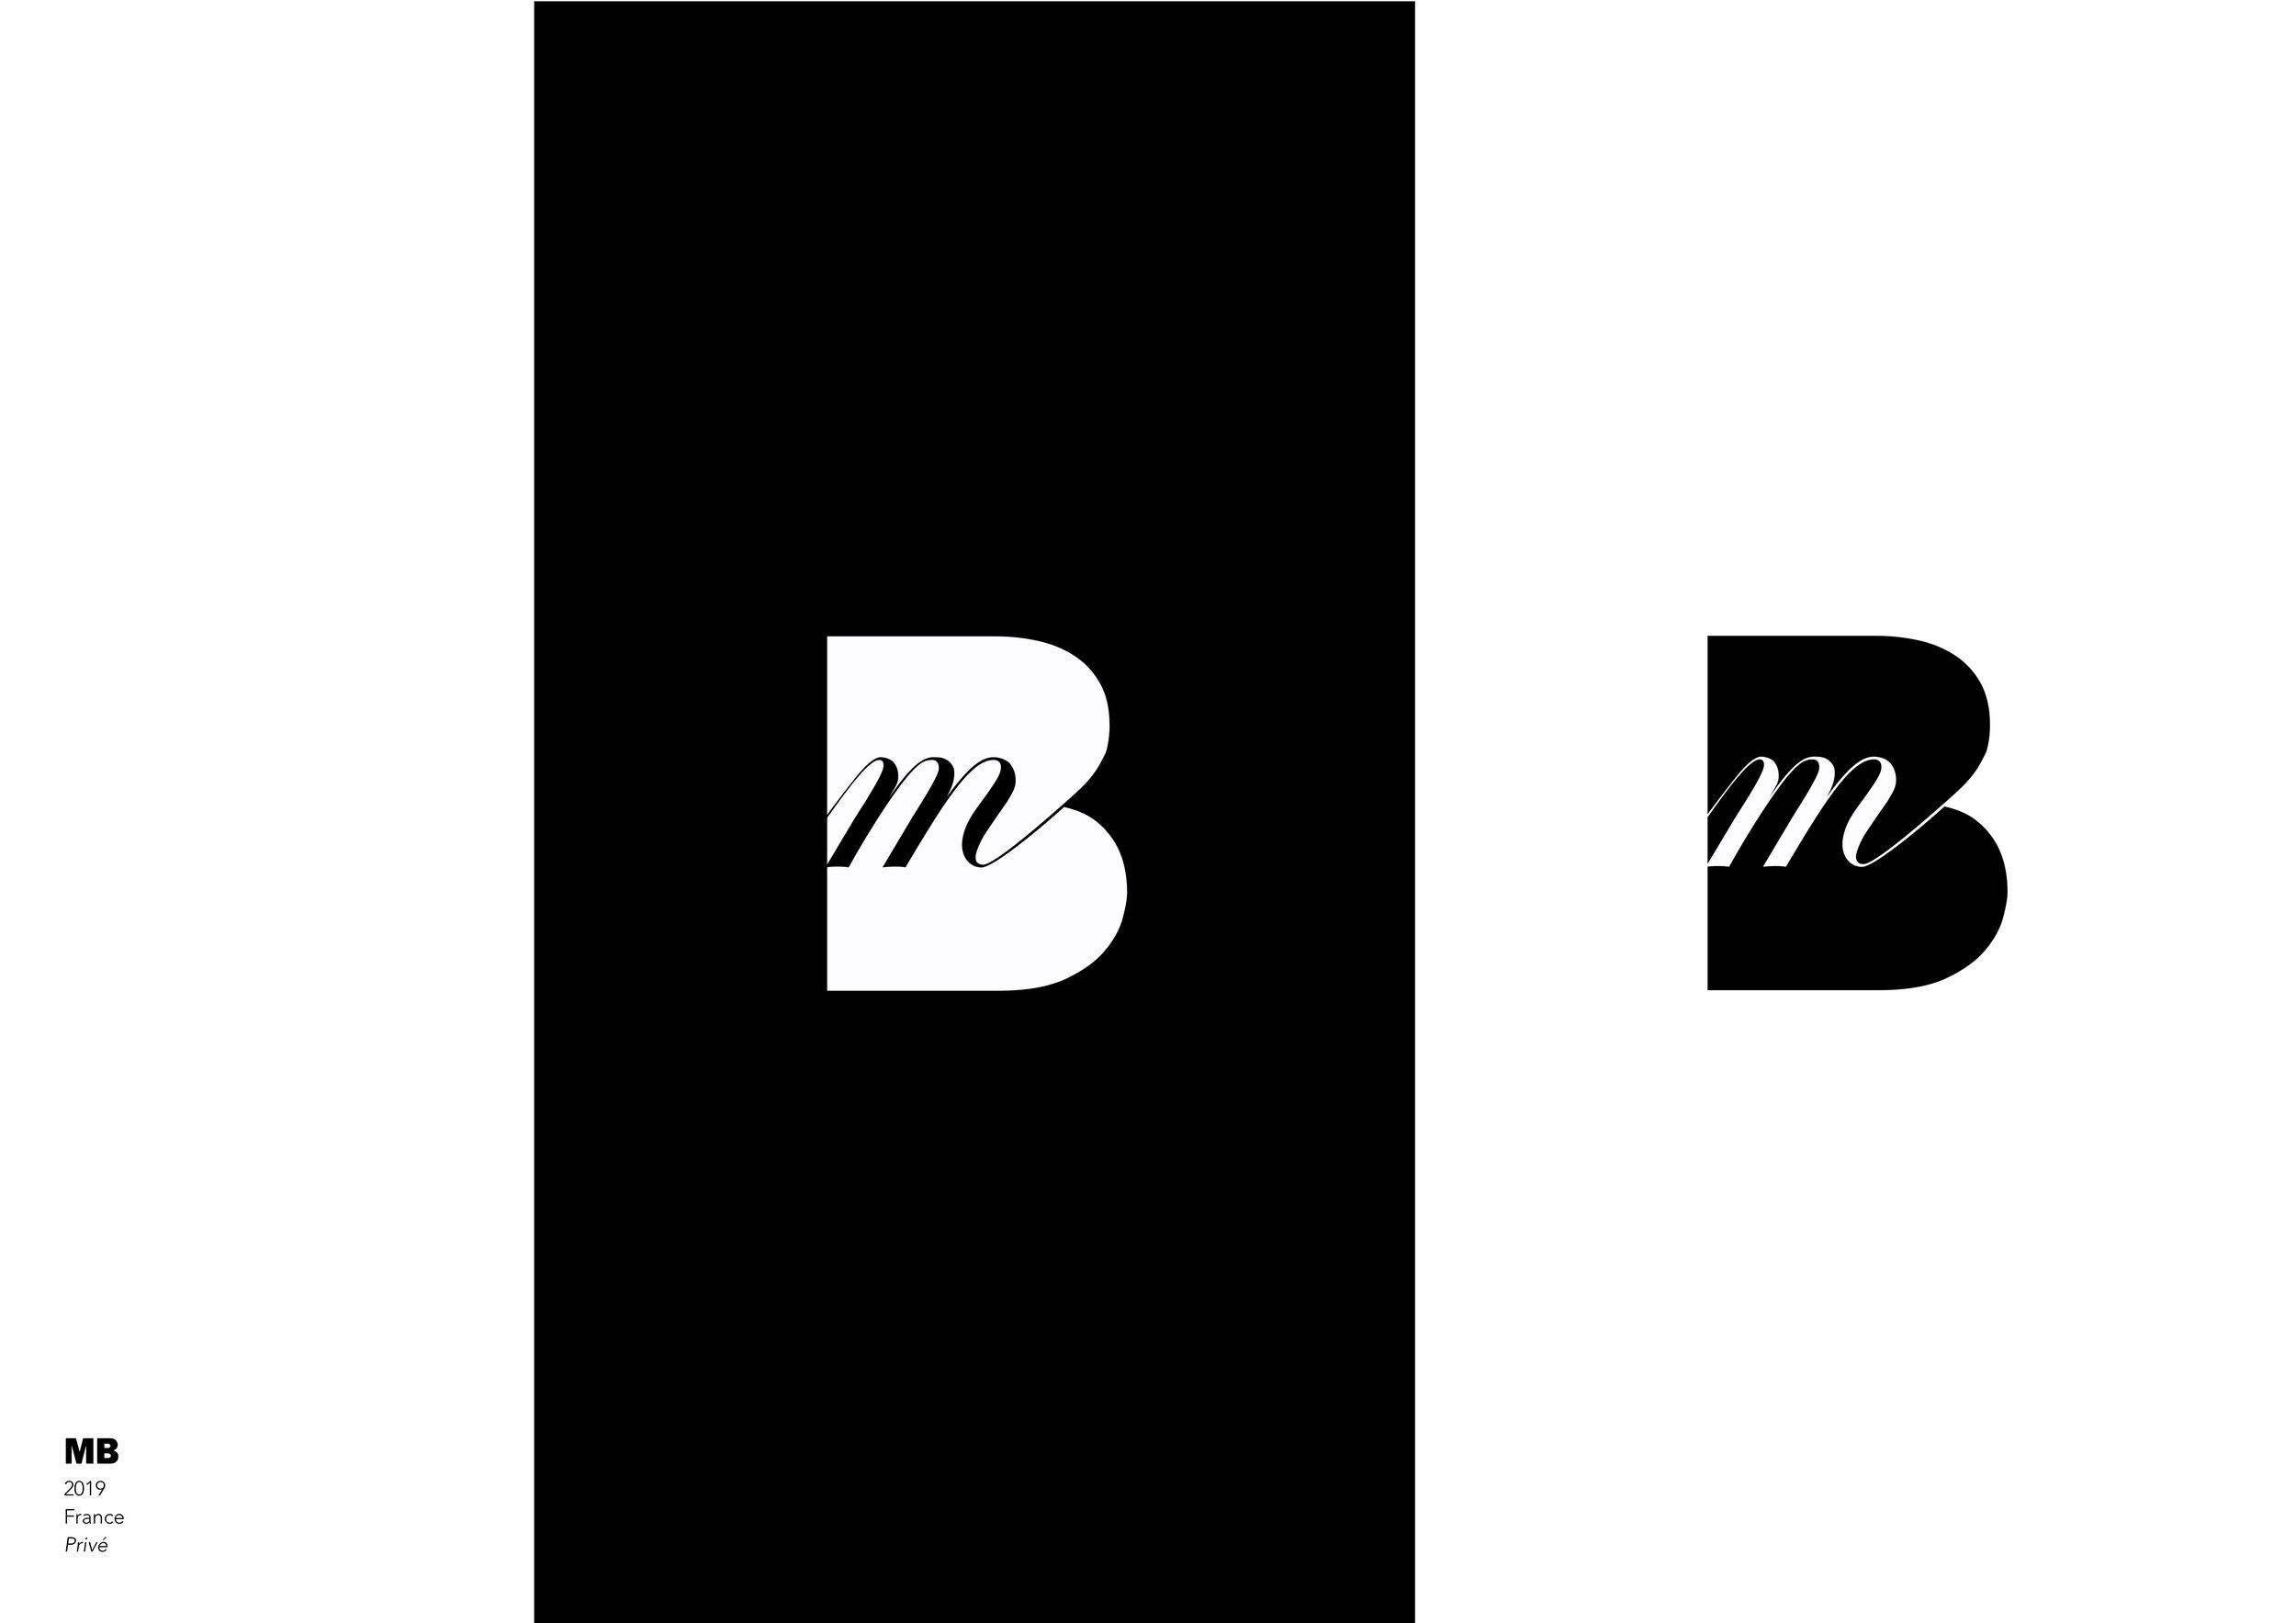 MB-monogram-logo-design-joy-lasry.jpg